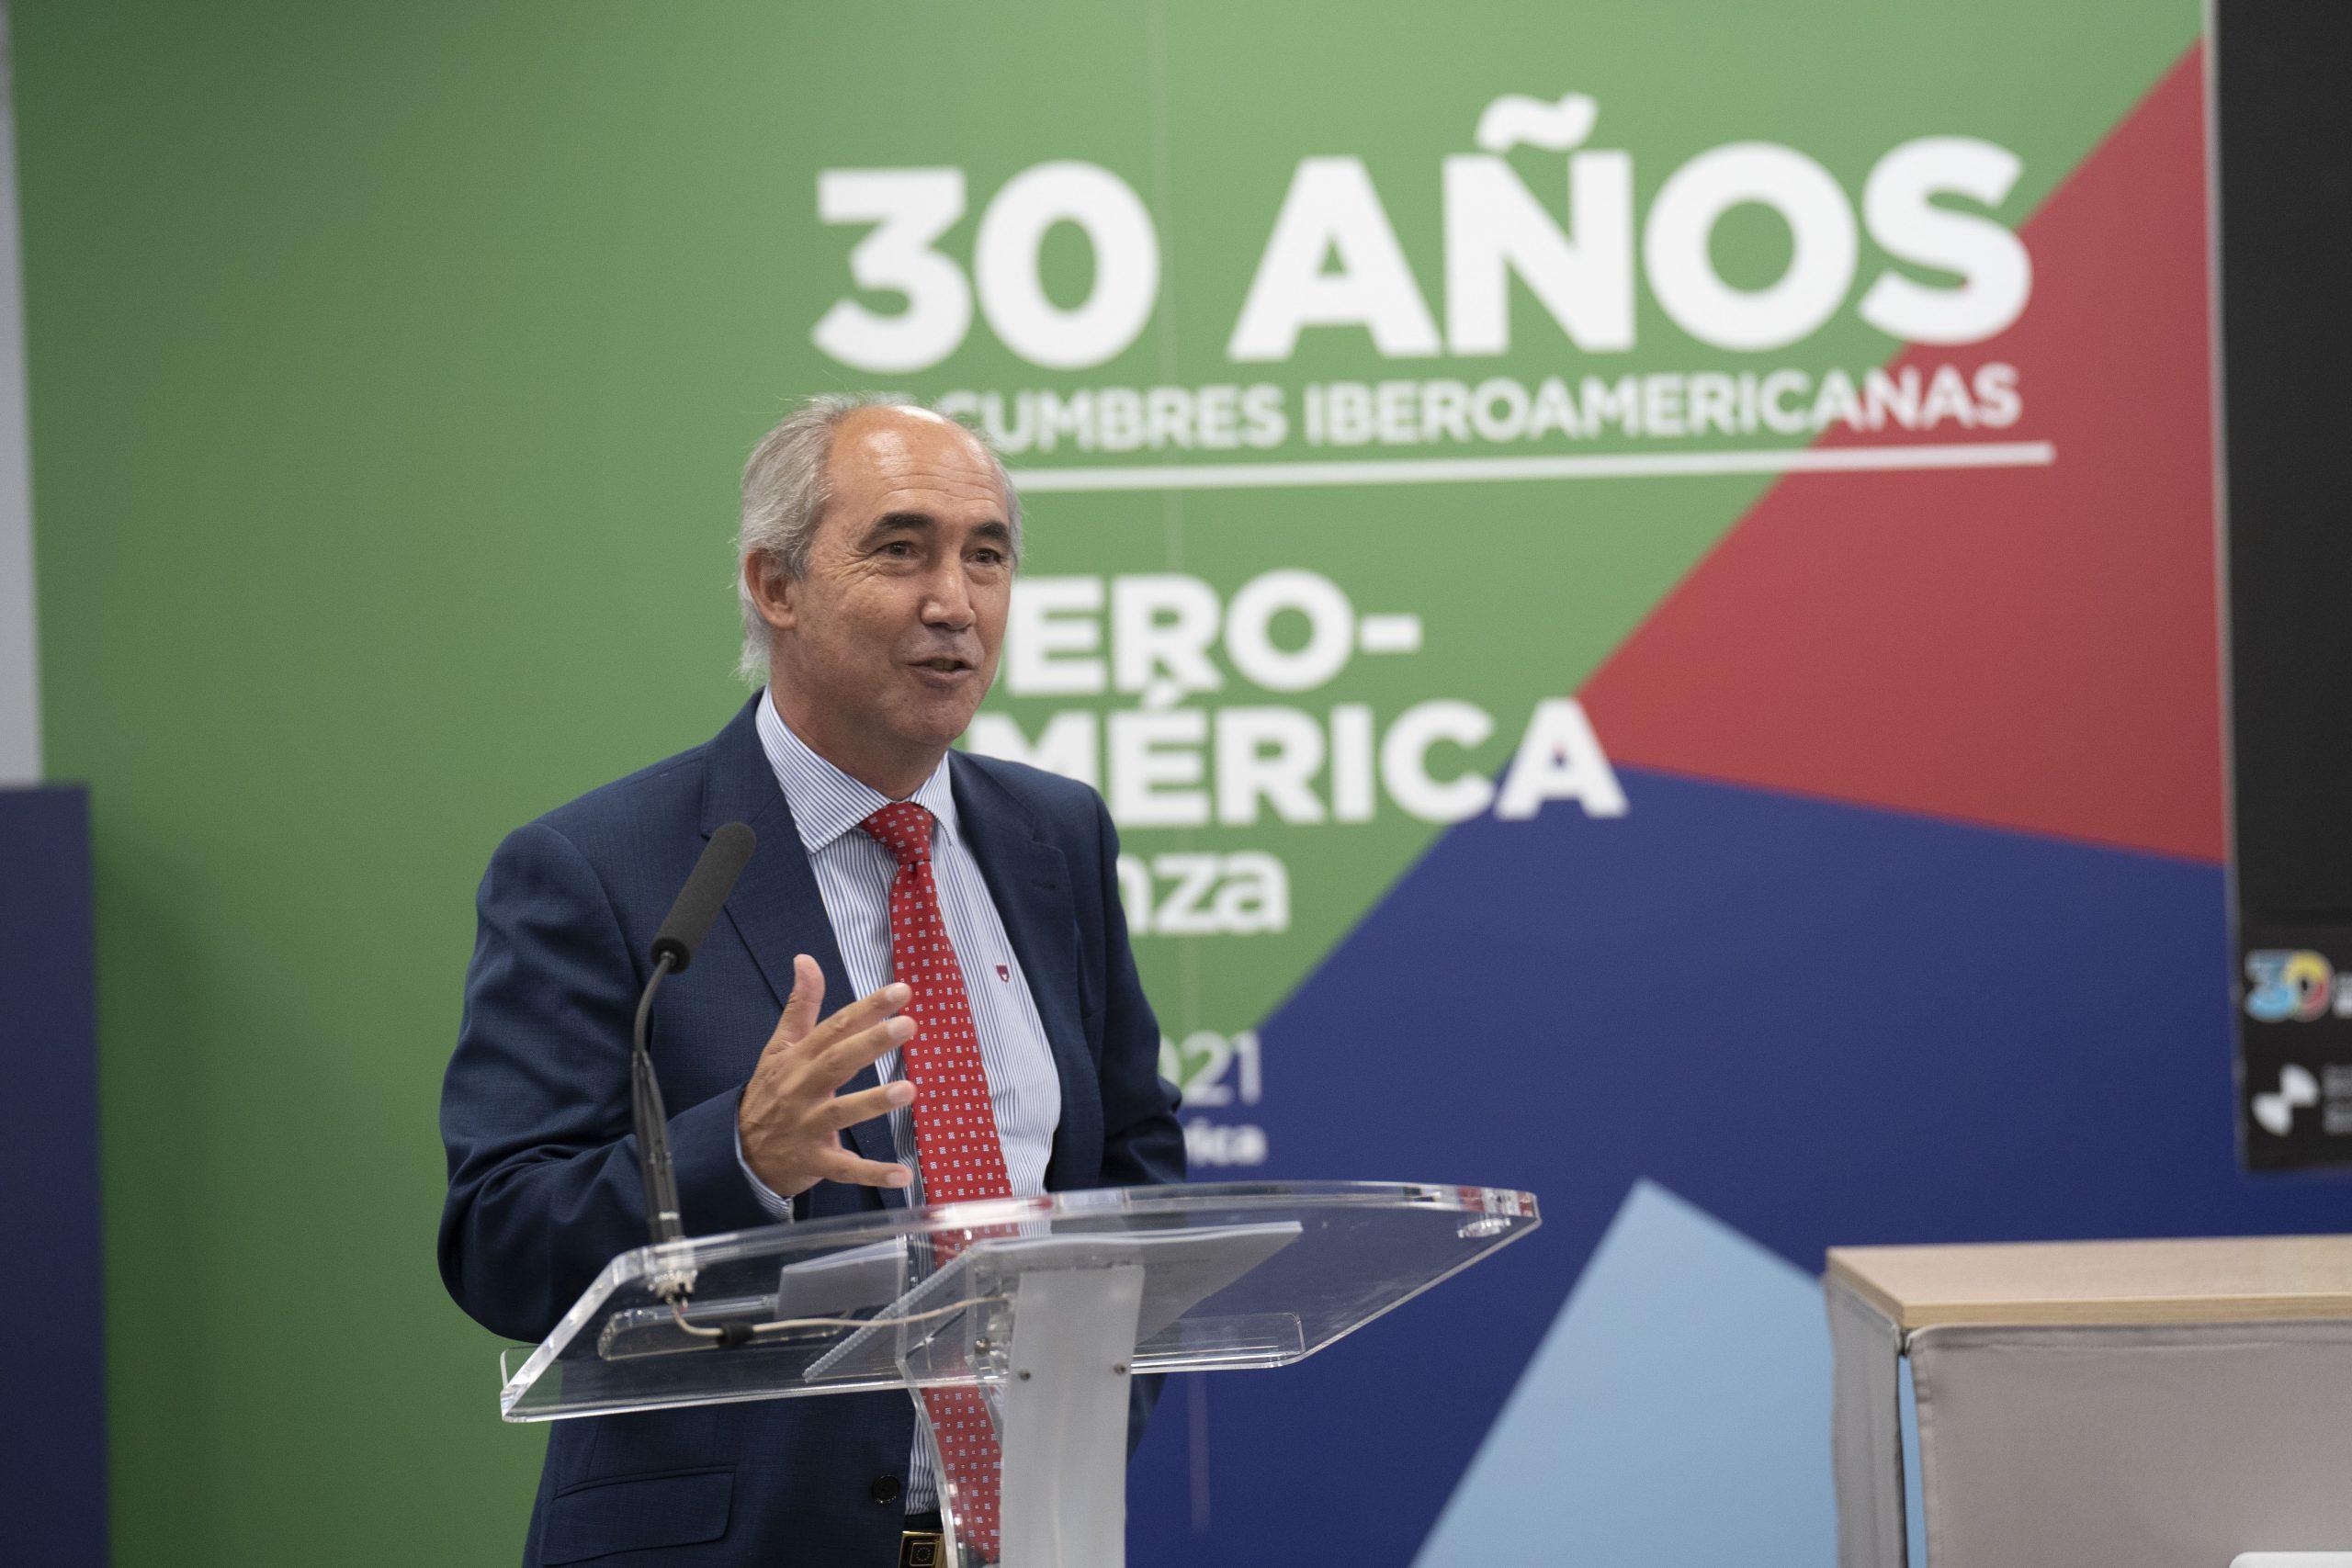 Director del Informe, Manuel Balmaseda